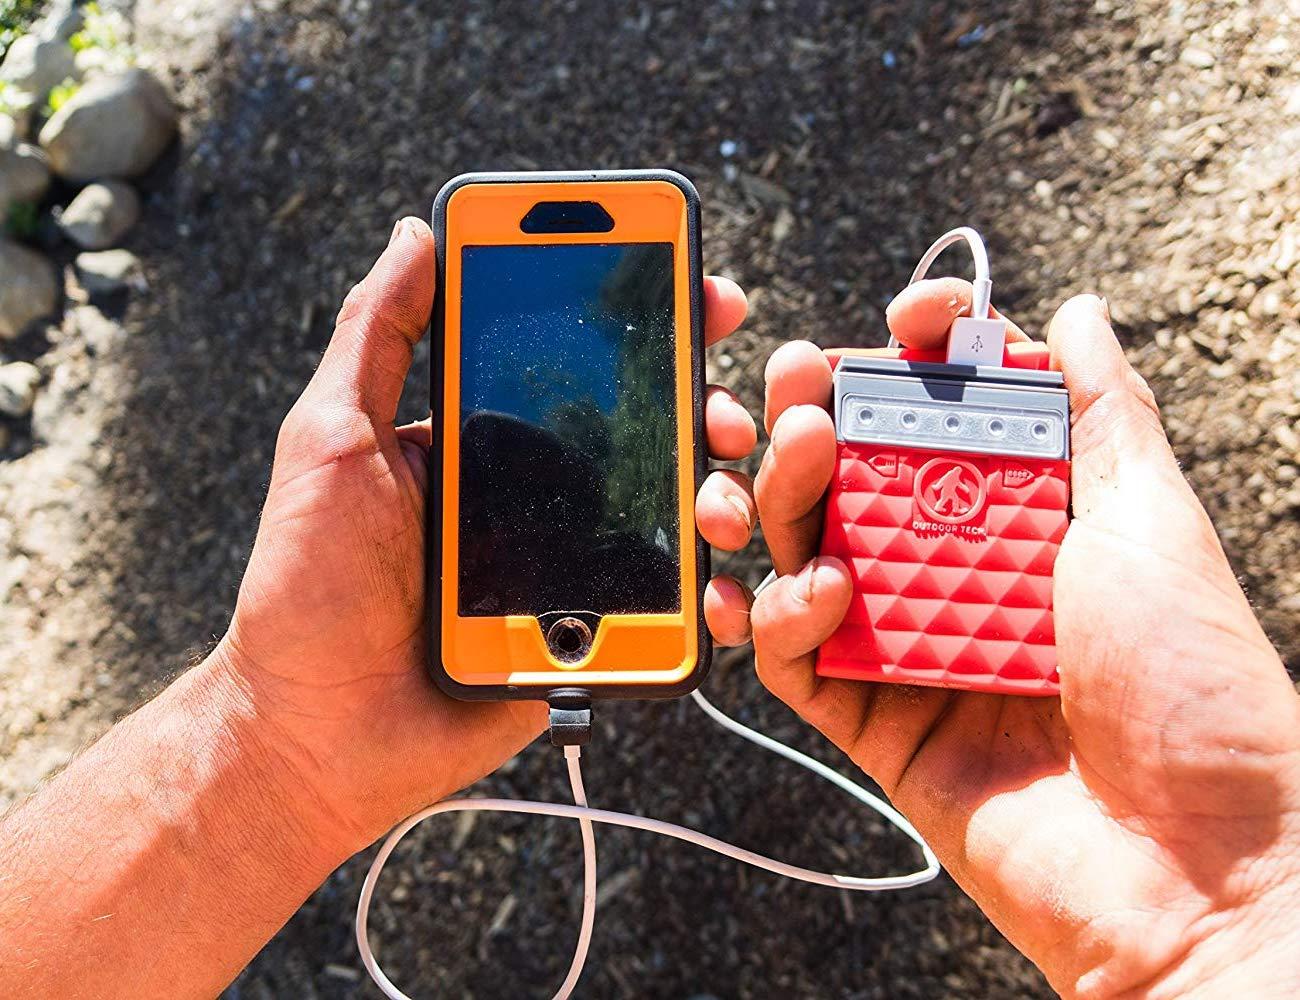 Outdoor Tech Kodiak Mini 2.0 Waterproof Power Bank provides power on the go